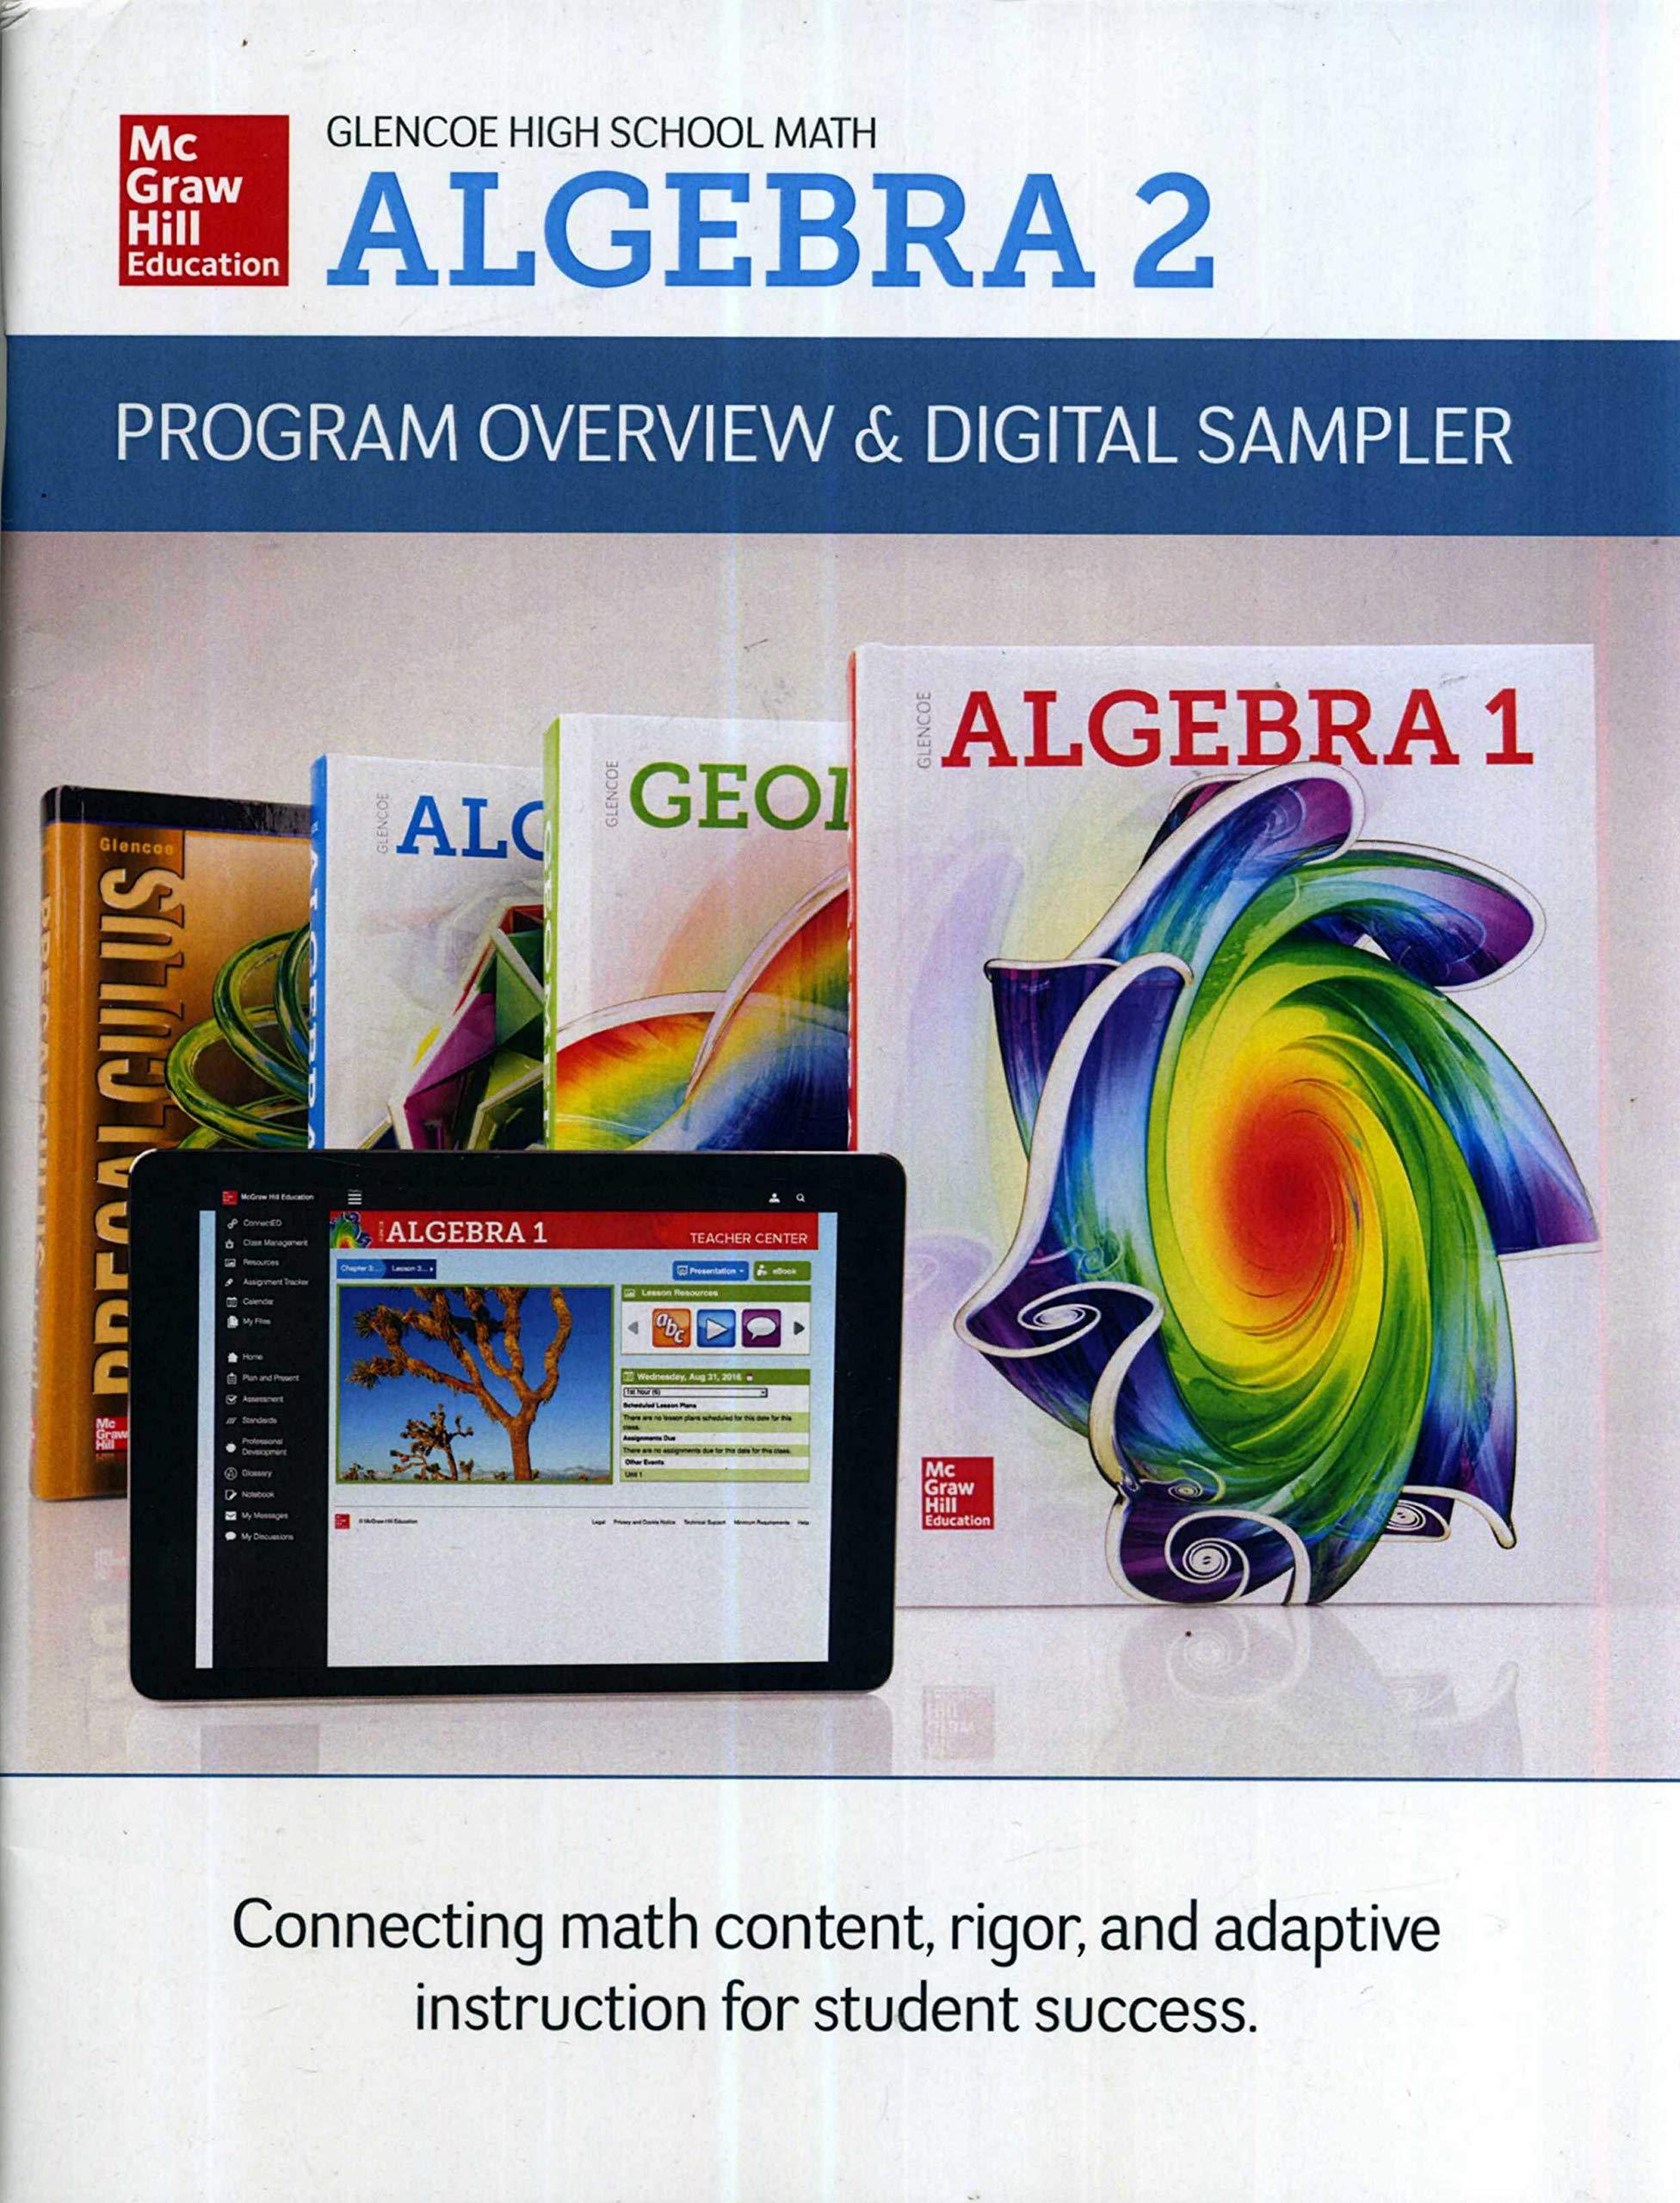 Glencoe High School Math Algebra 2 Program Overview and